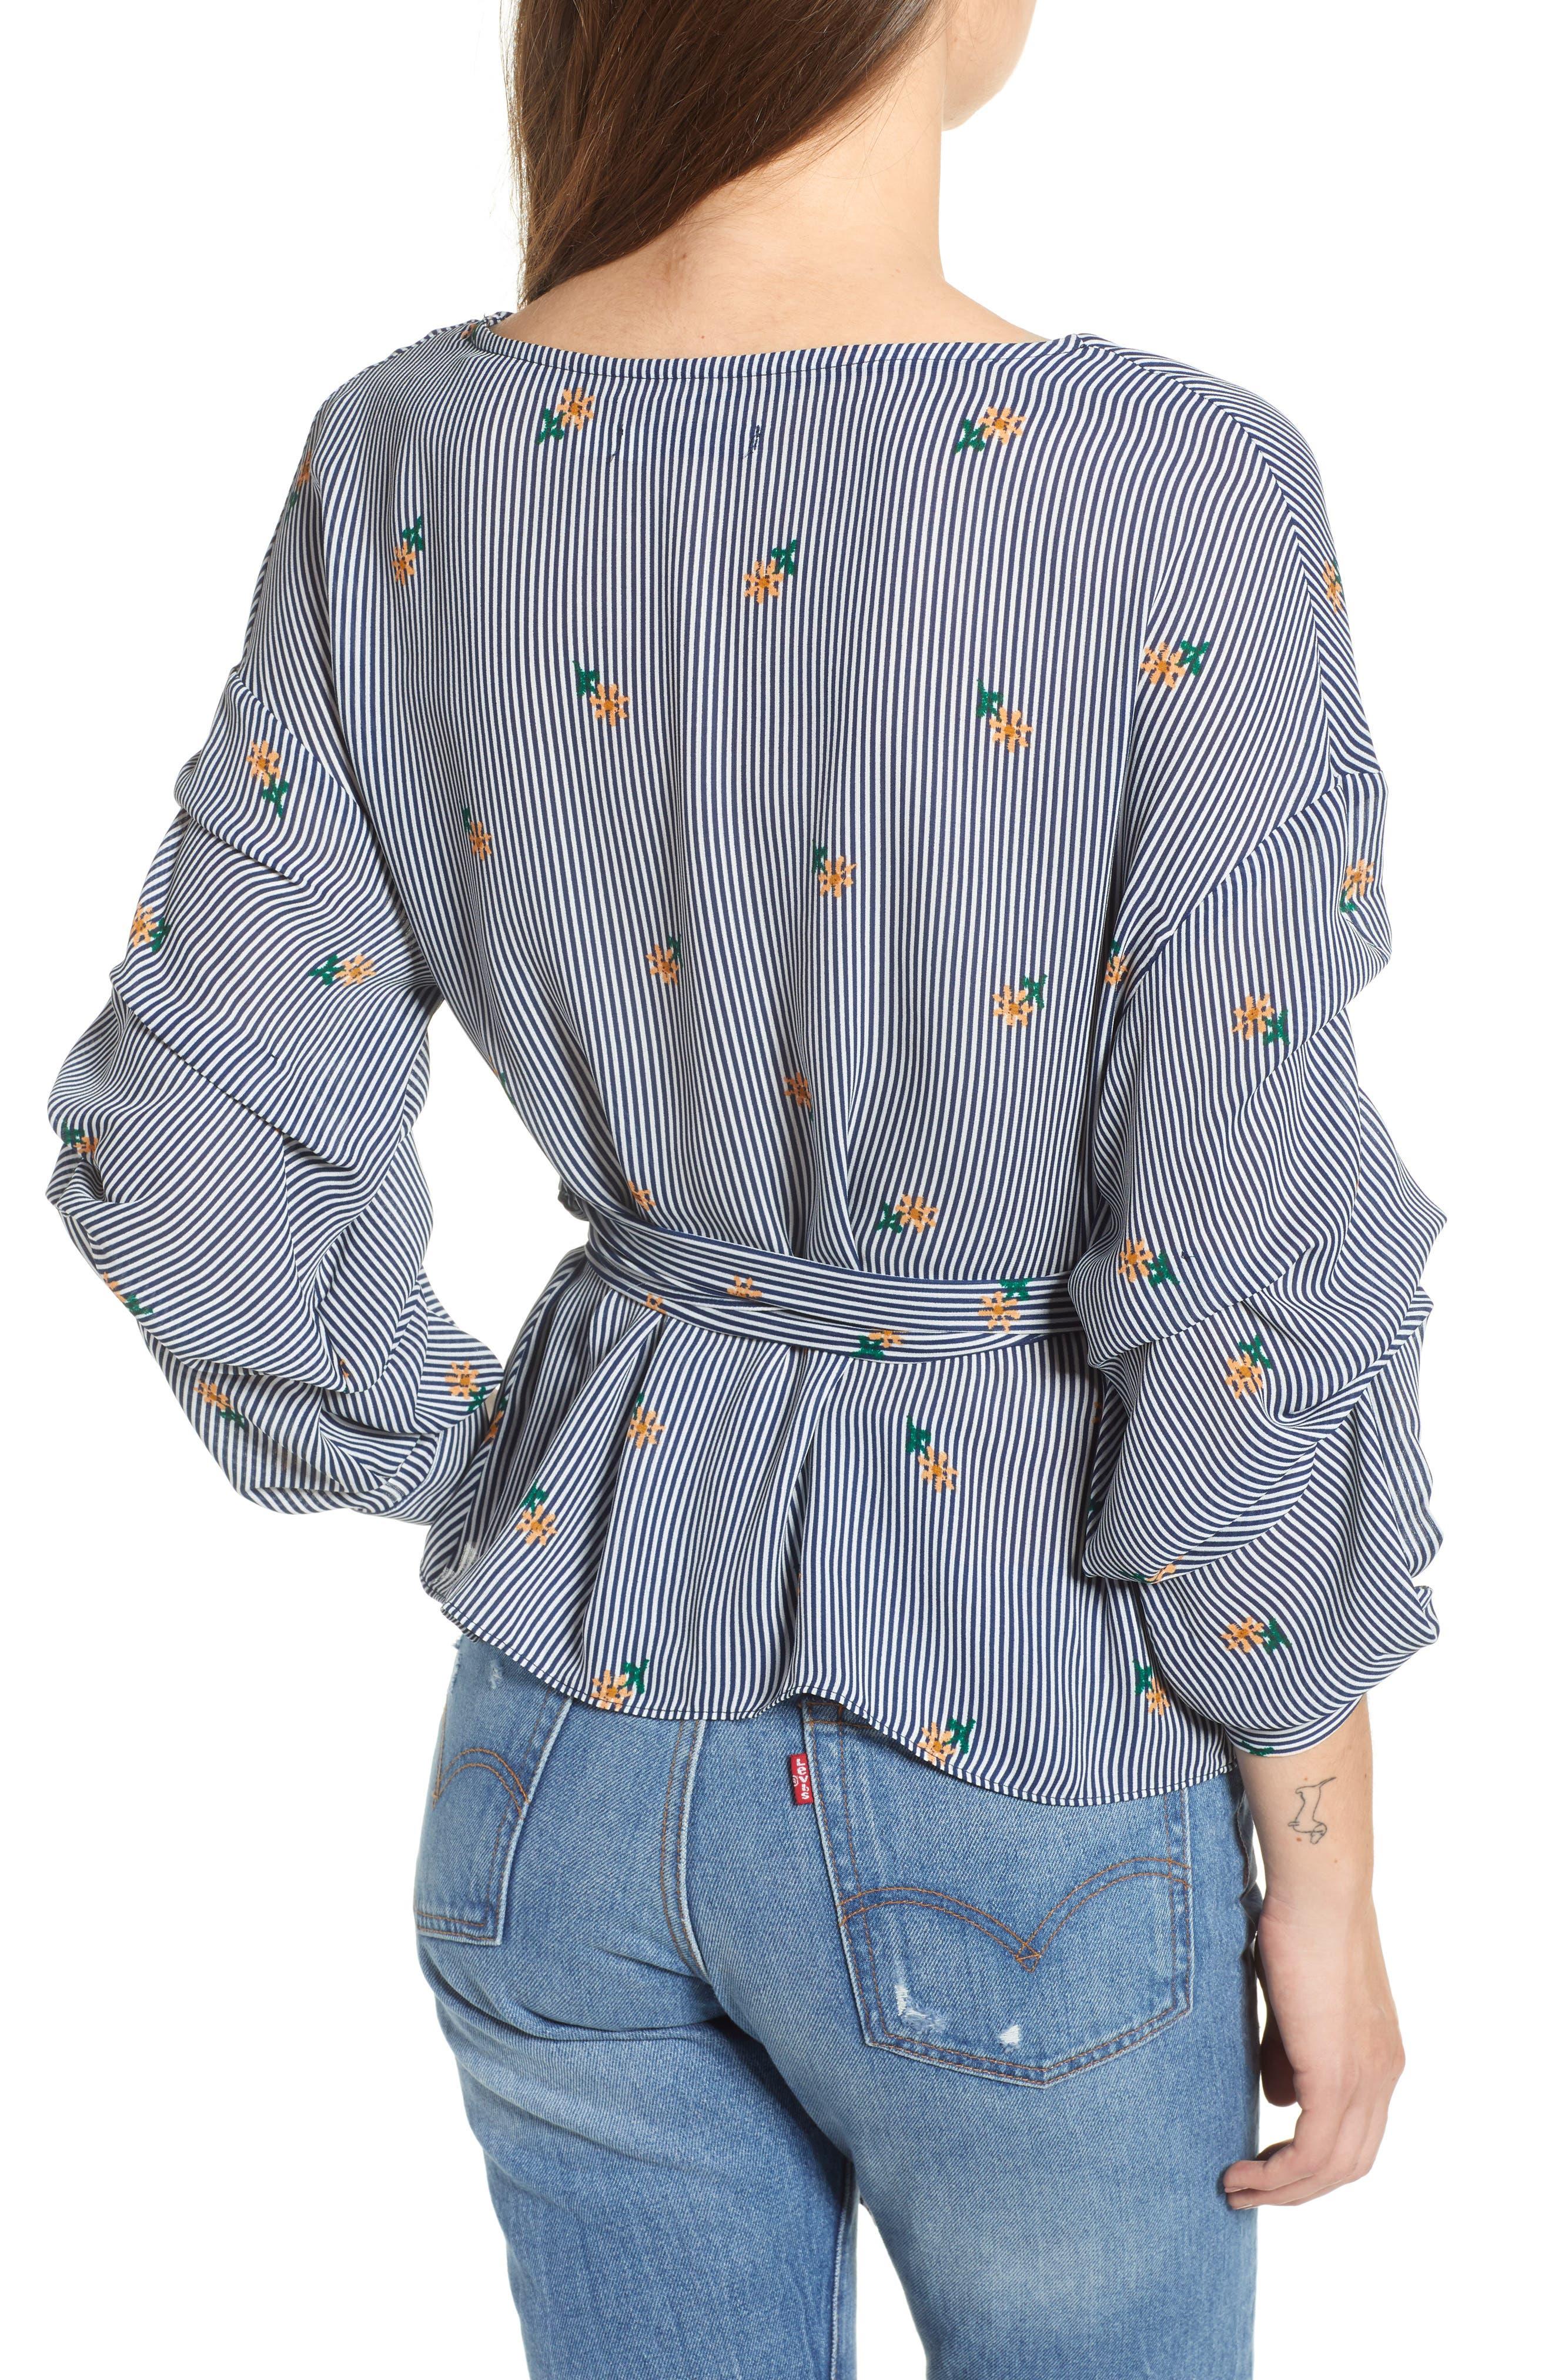 Bishop + Young Majorca Stripe Wrap Top,                             Alternate thumbnail 2, color,                             Majorca Stripe